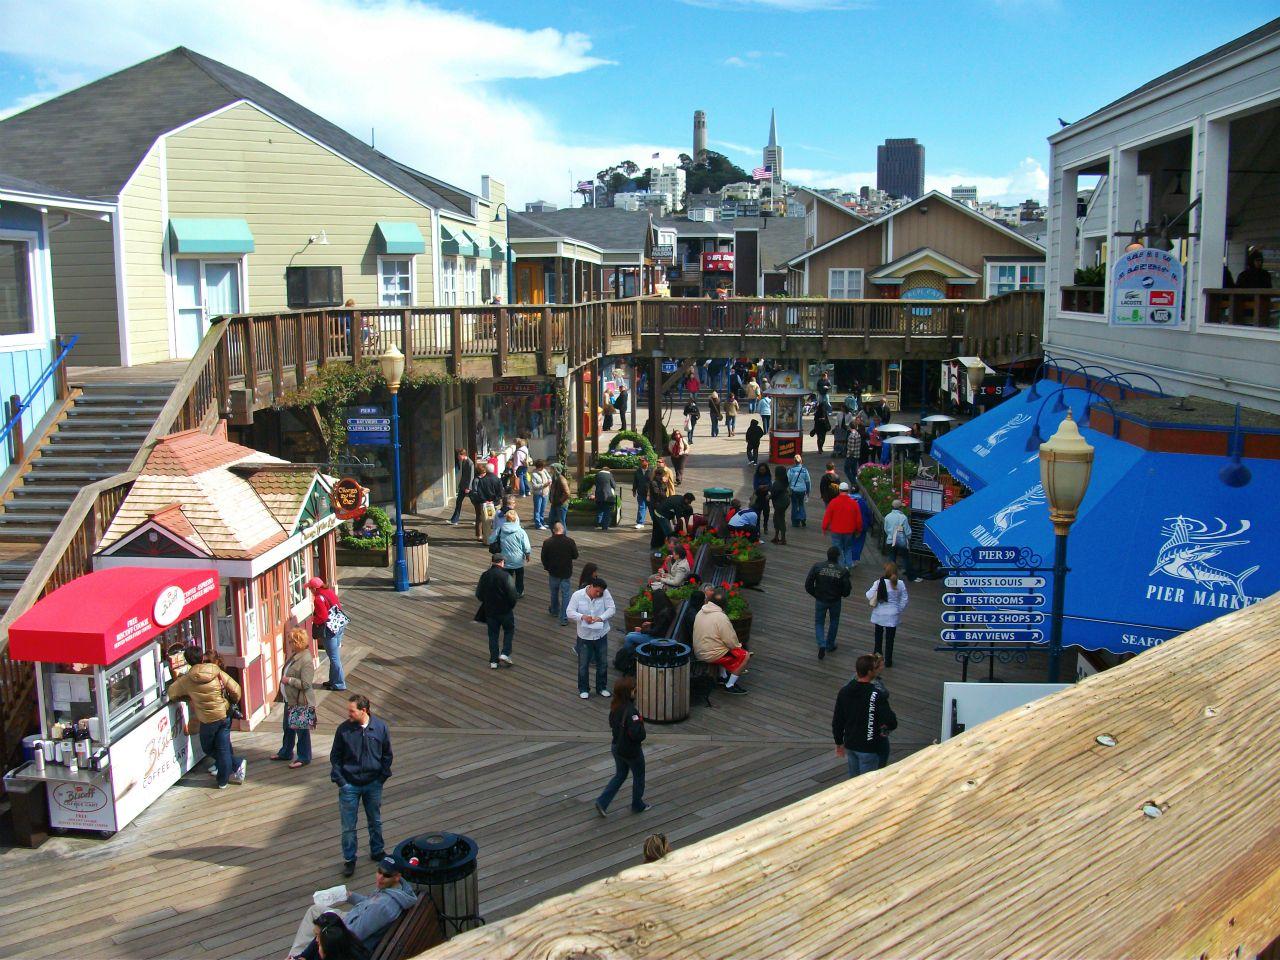 Fisherman's Wharf San Francisco Pier 39